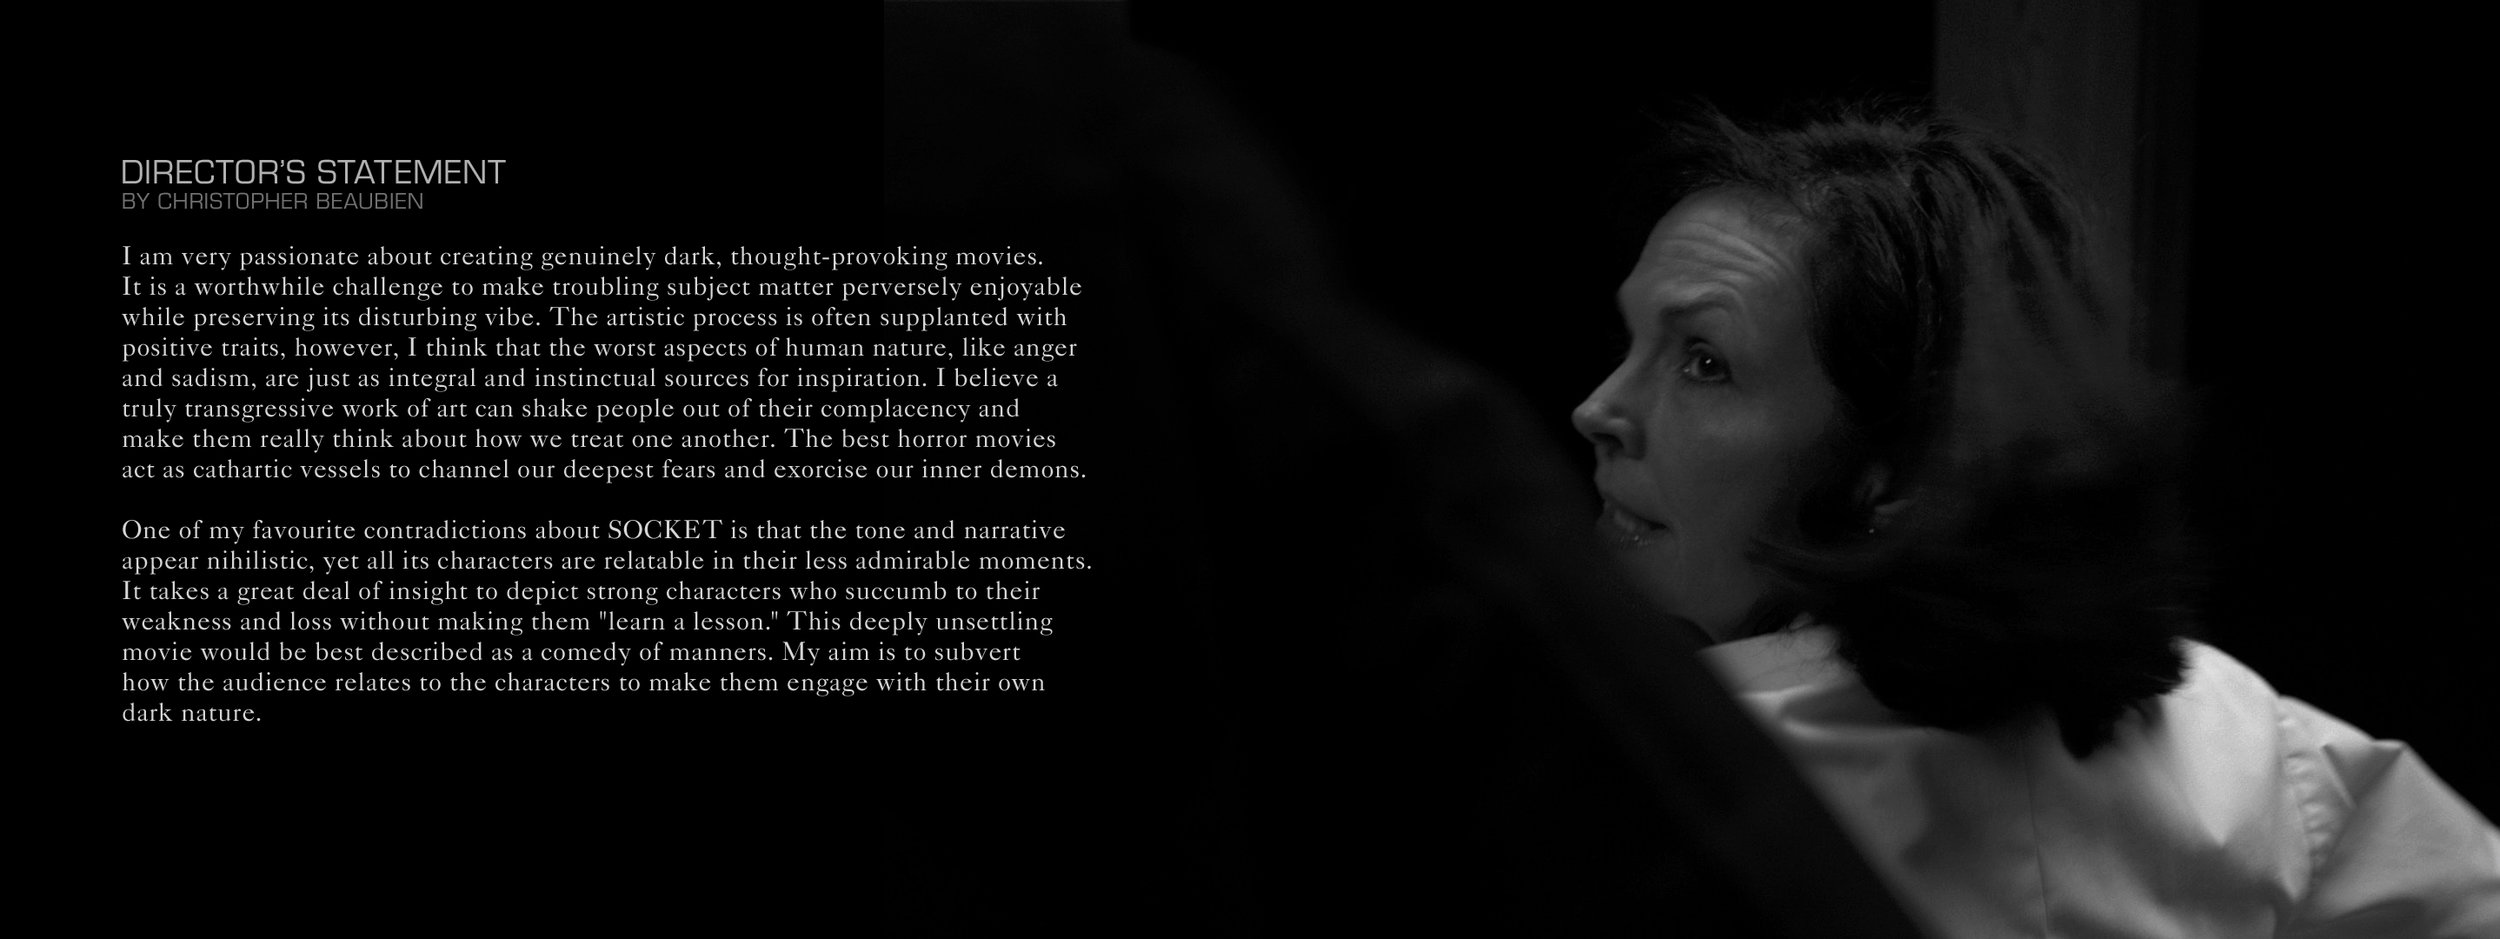 SOCKET - Director's Statement.jpg